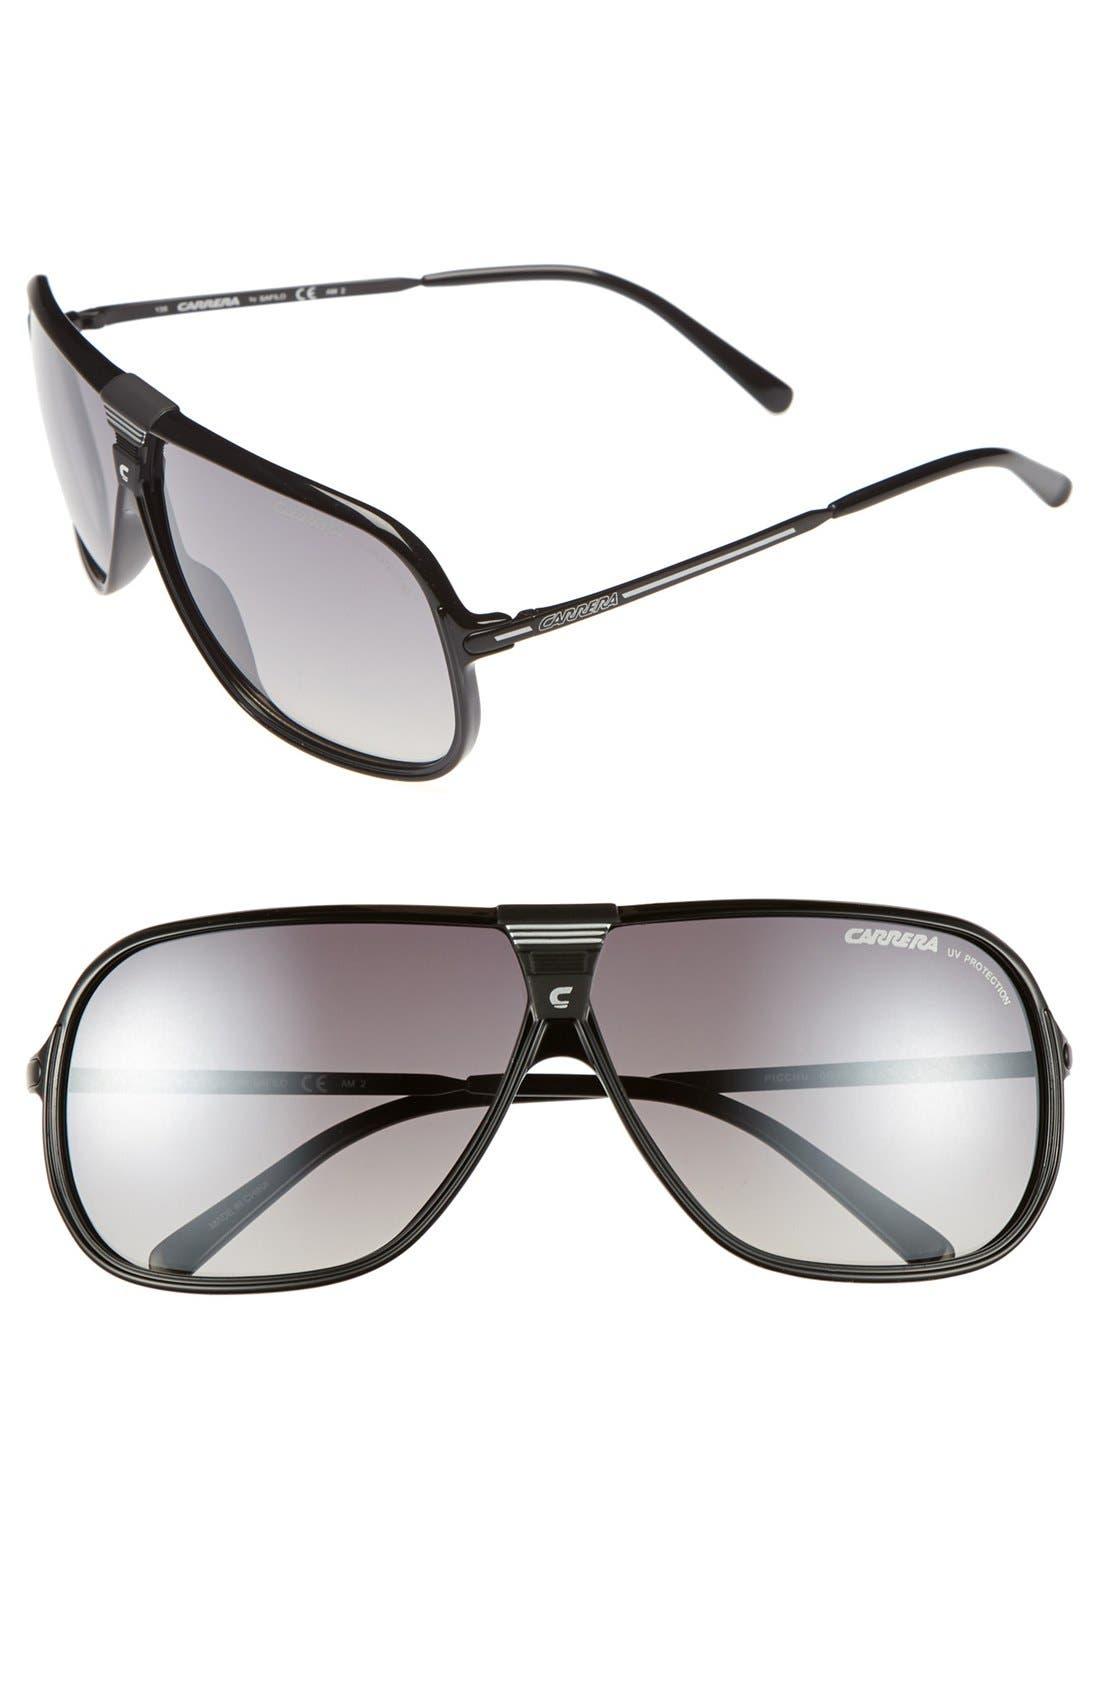 Main Image - Carrera Eyewear 'Picchu' 64mm Sunglasses